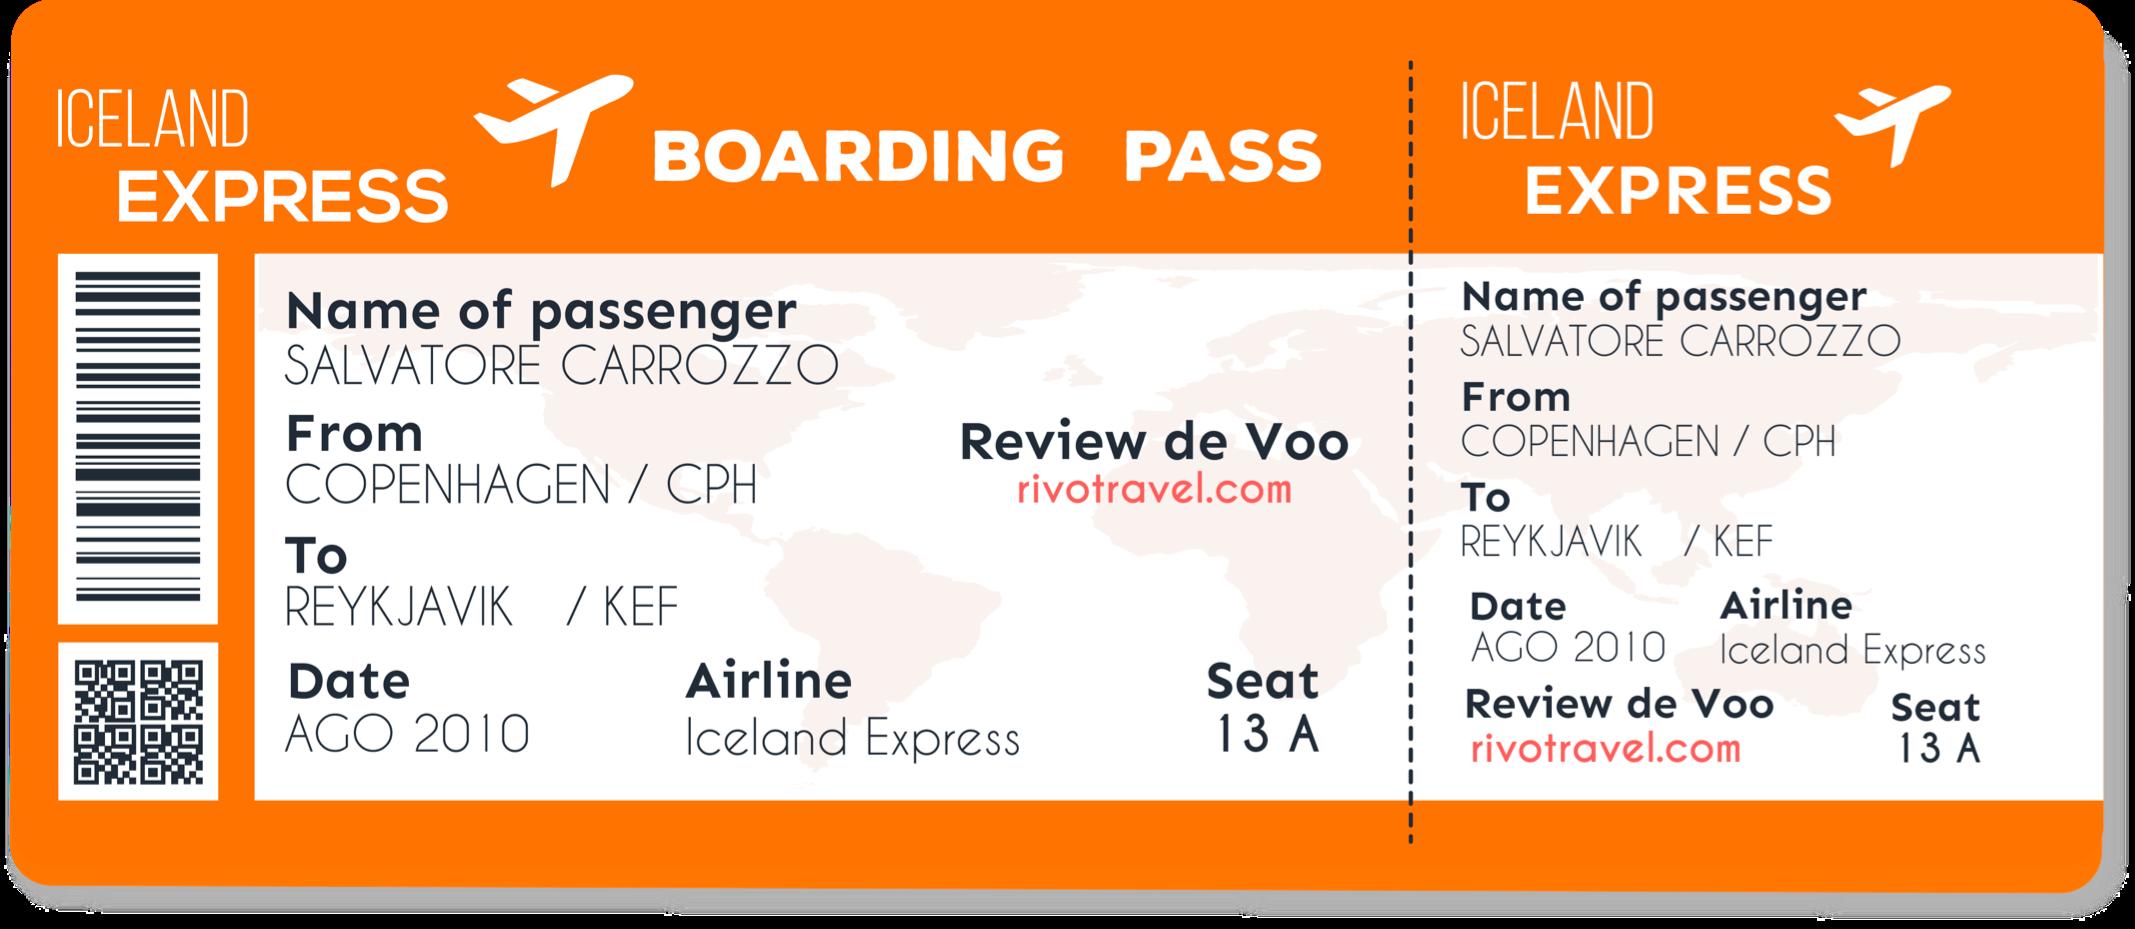 20170403-rivotravel-aviacao-review-voar-iceland-express-islandia-cph-kef